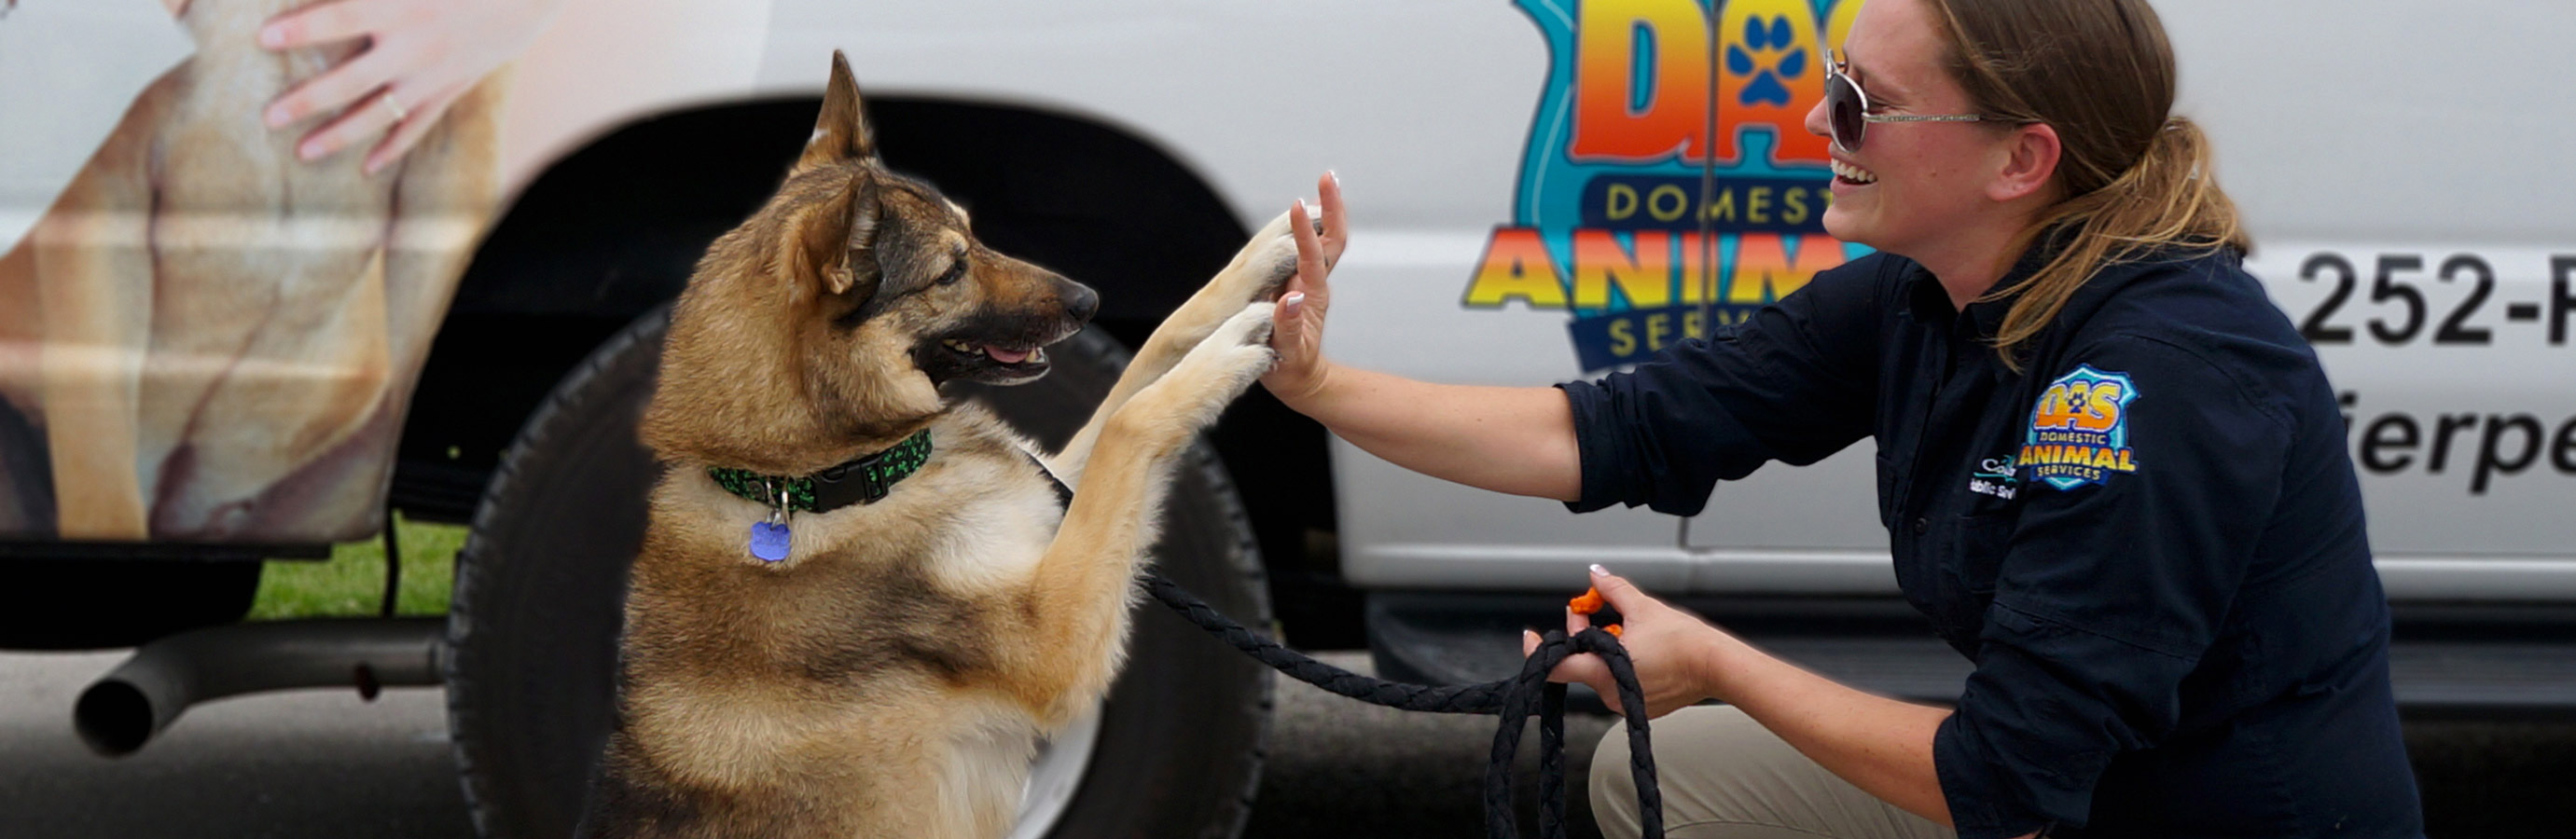 Florida Animal Control Association